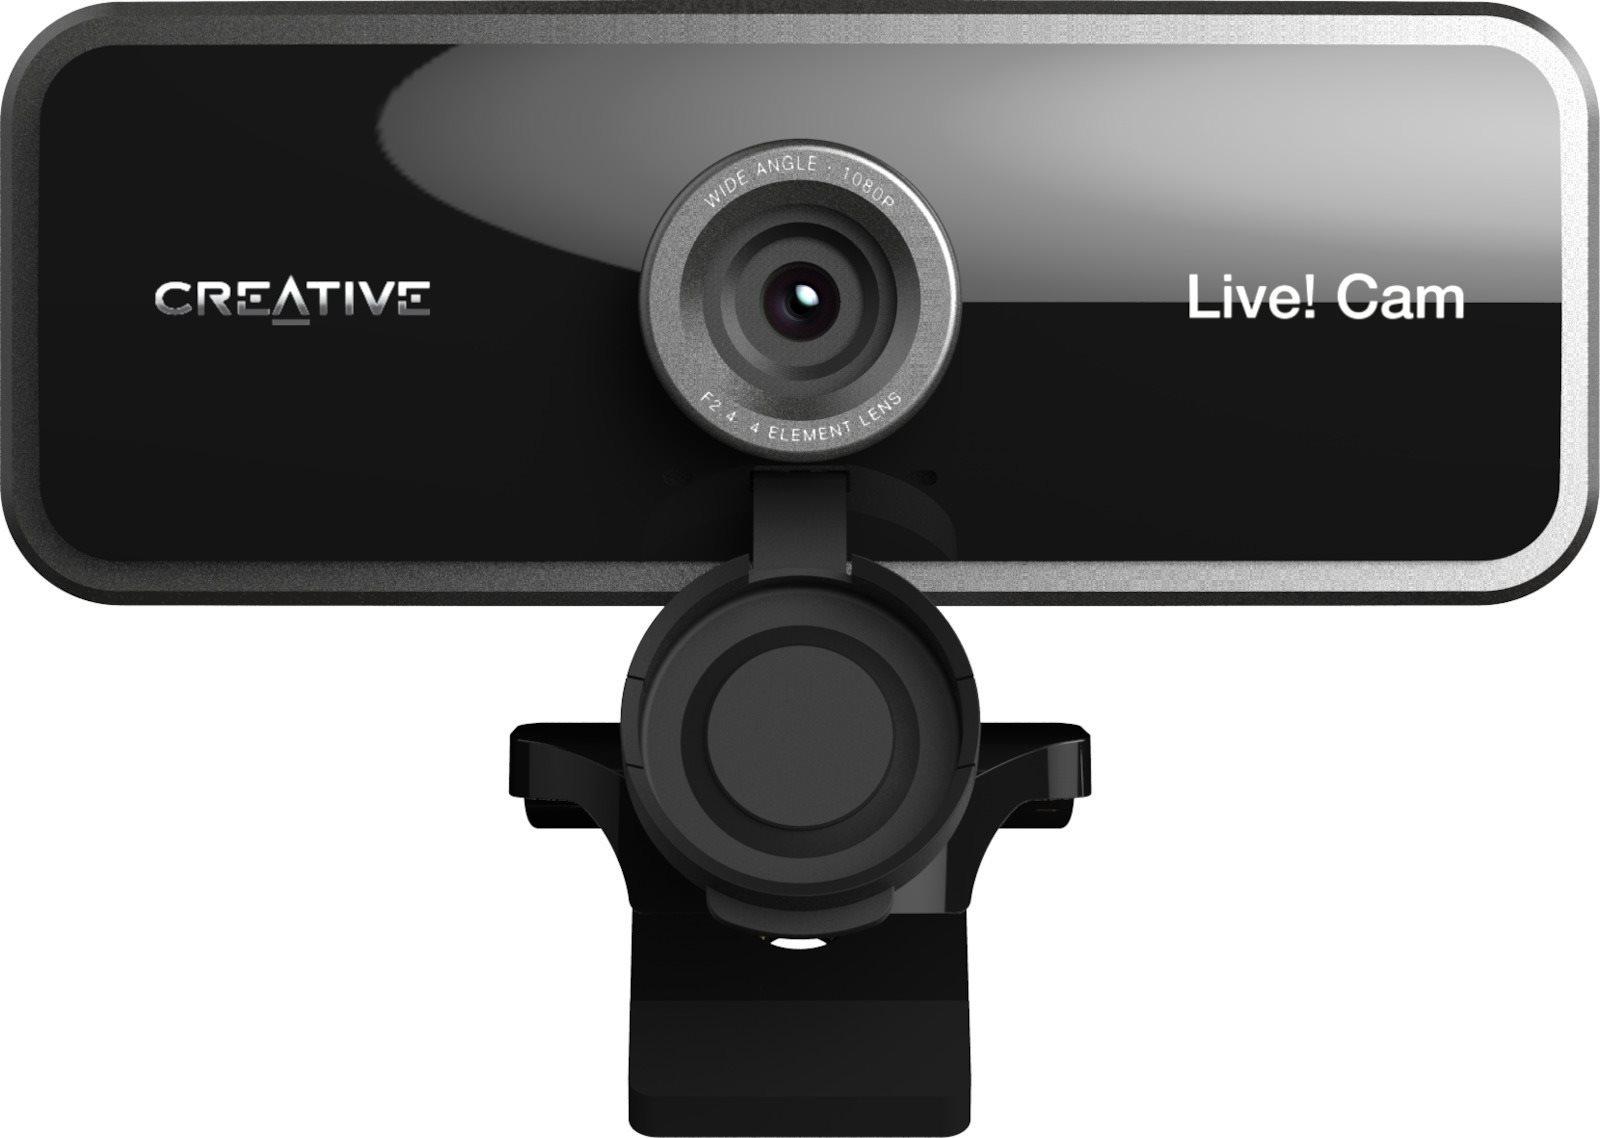 Creative Web Camera Live! Sync 1080P